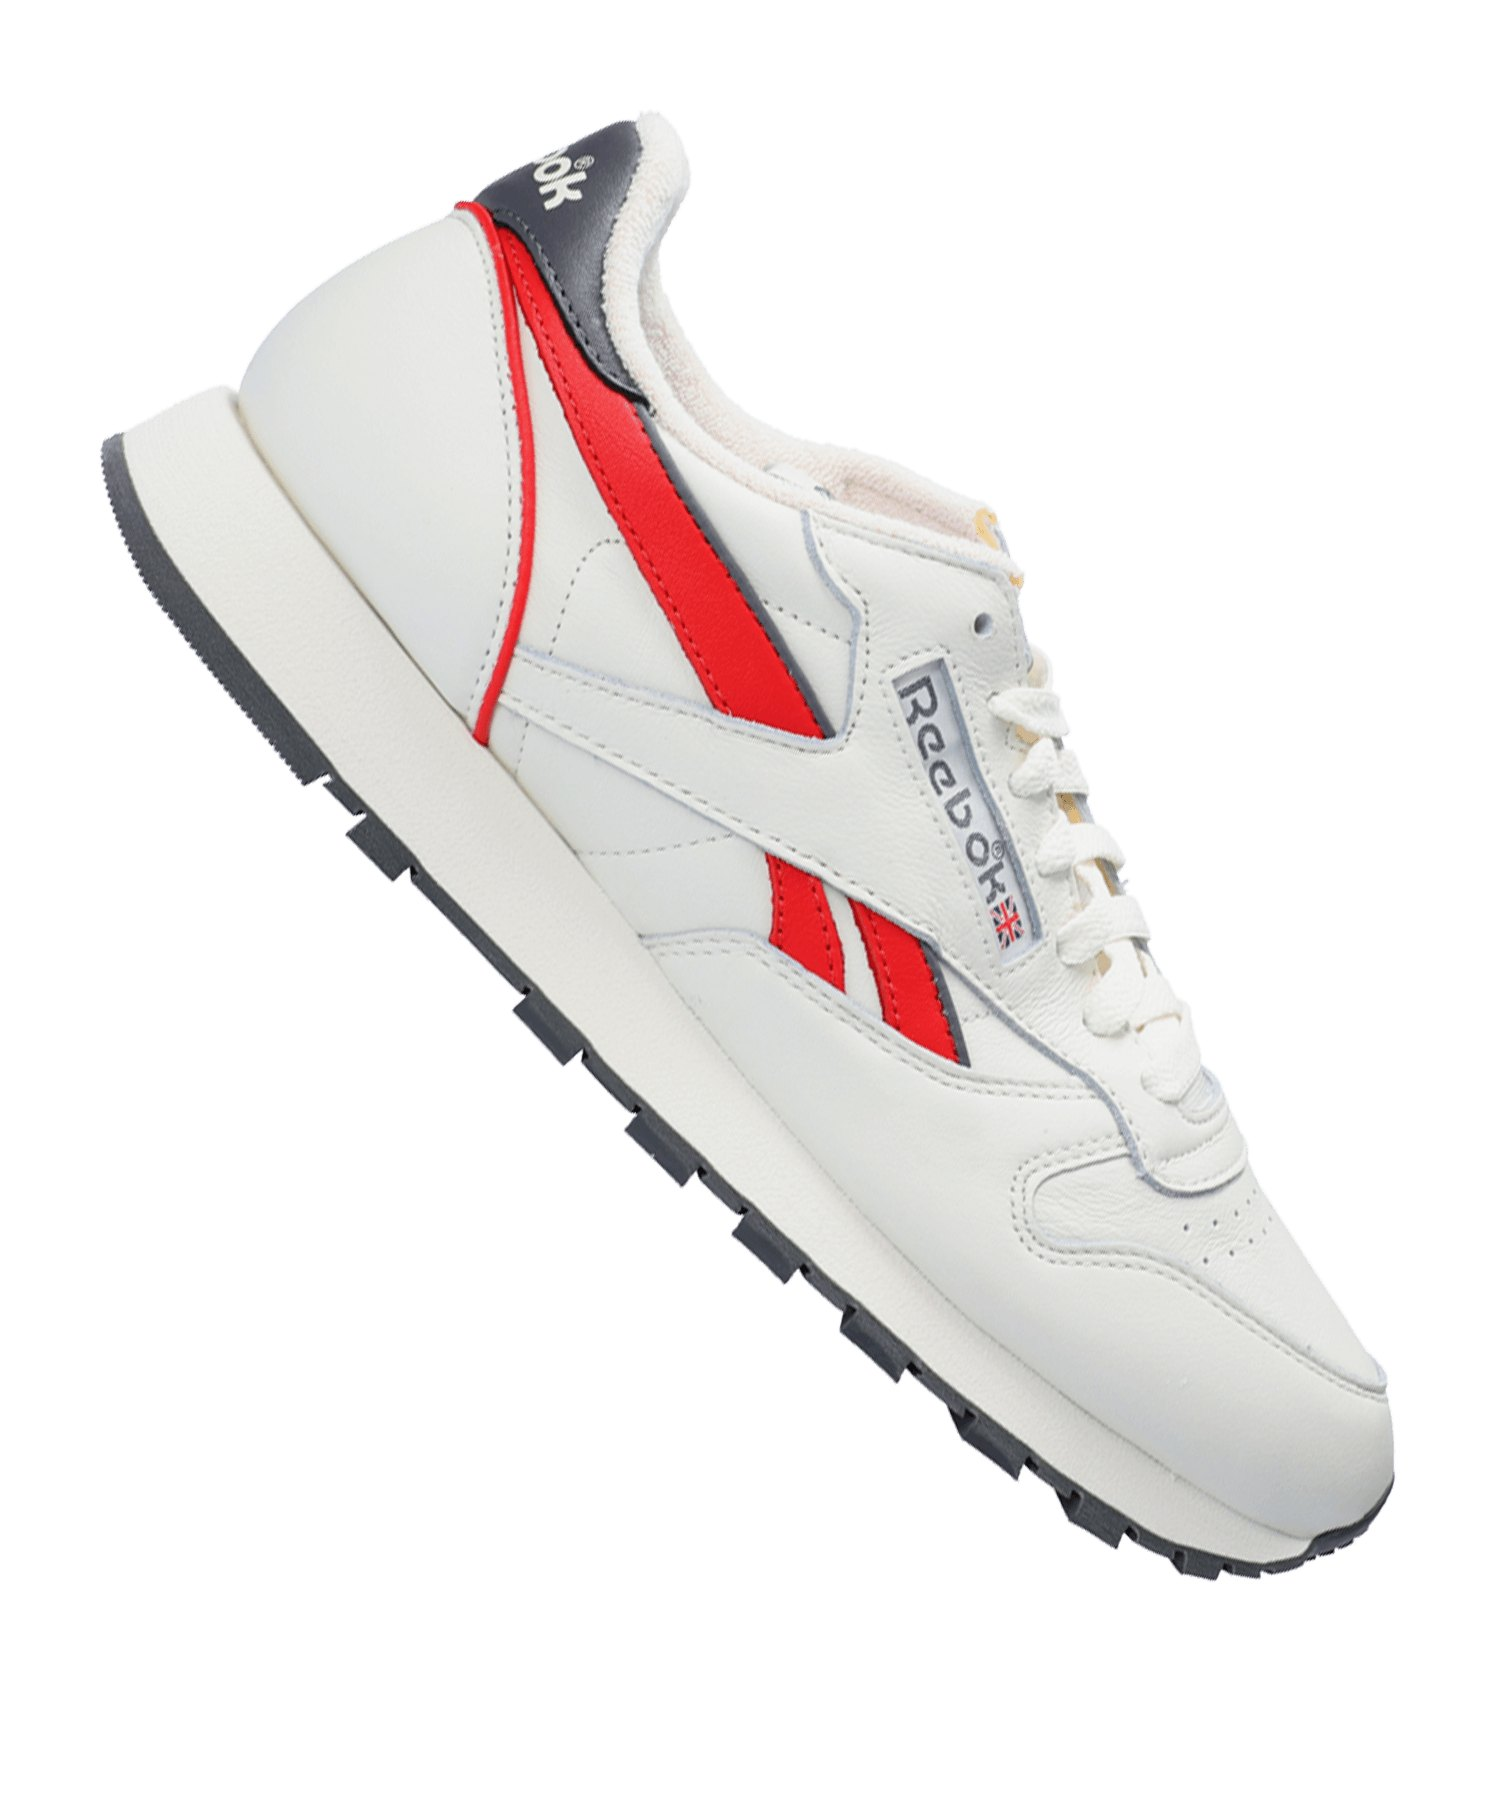 Reebok Classic Leather MU Sneaker Grau Rot - grau